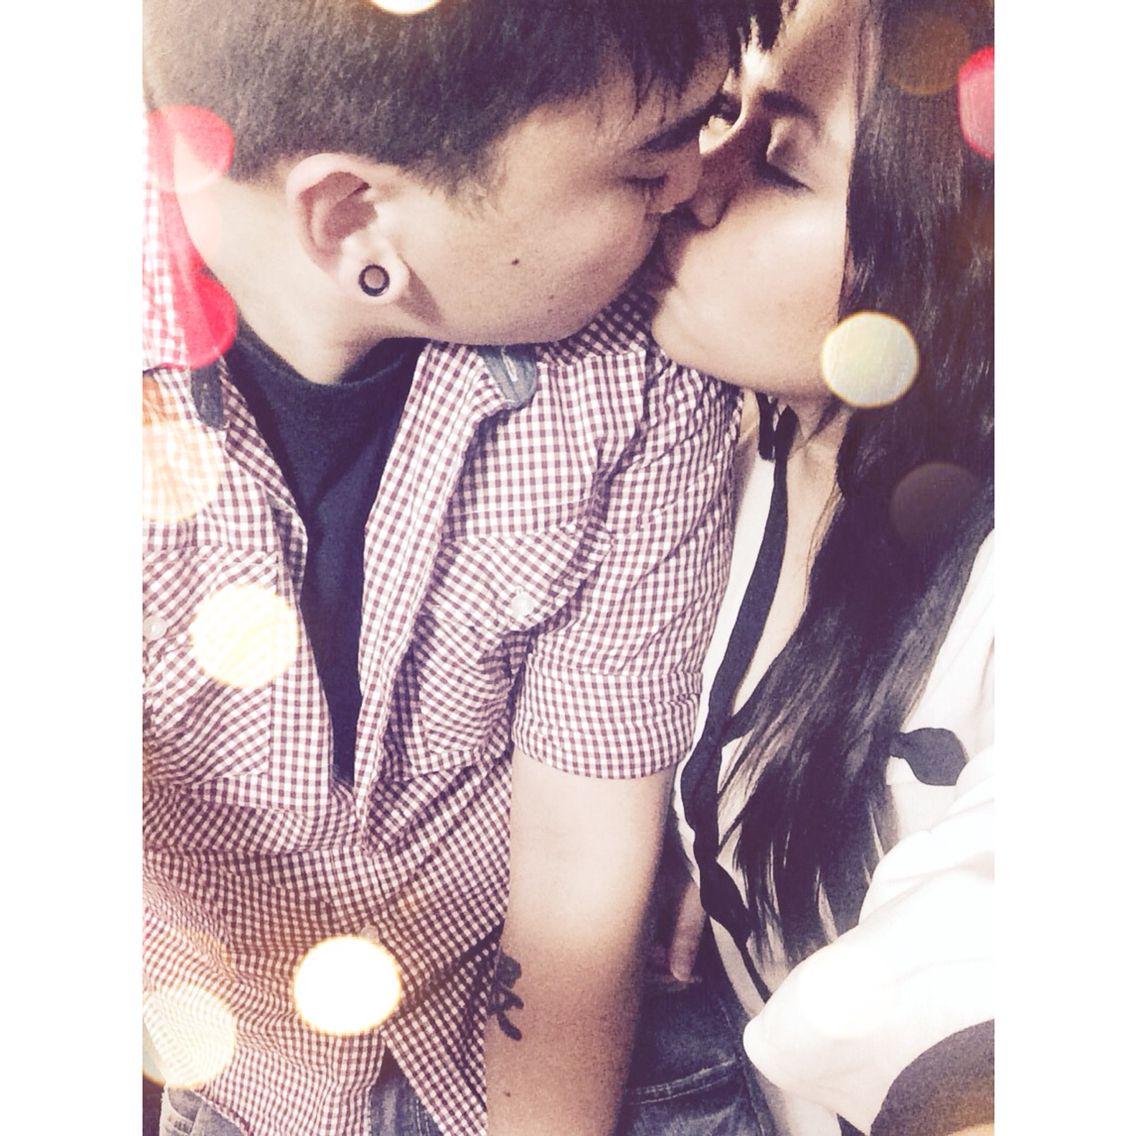 New Years kiss 2015